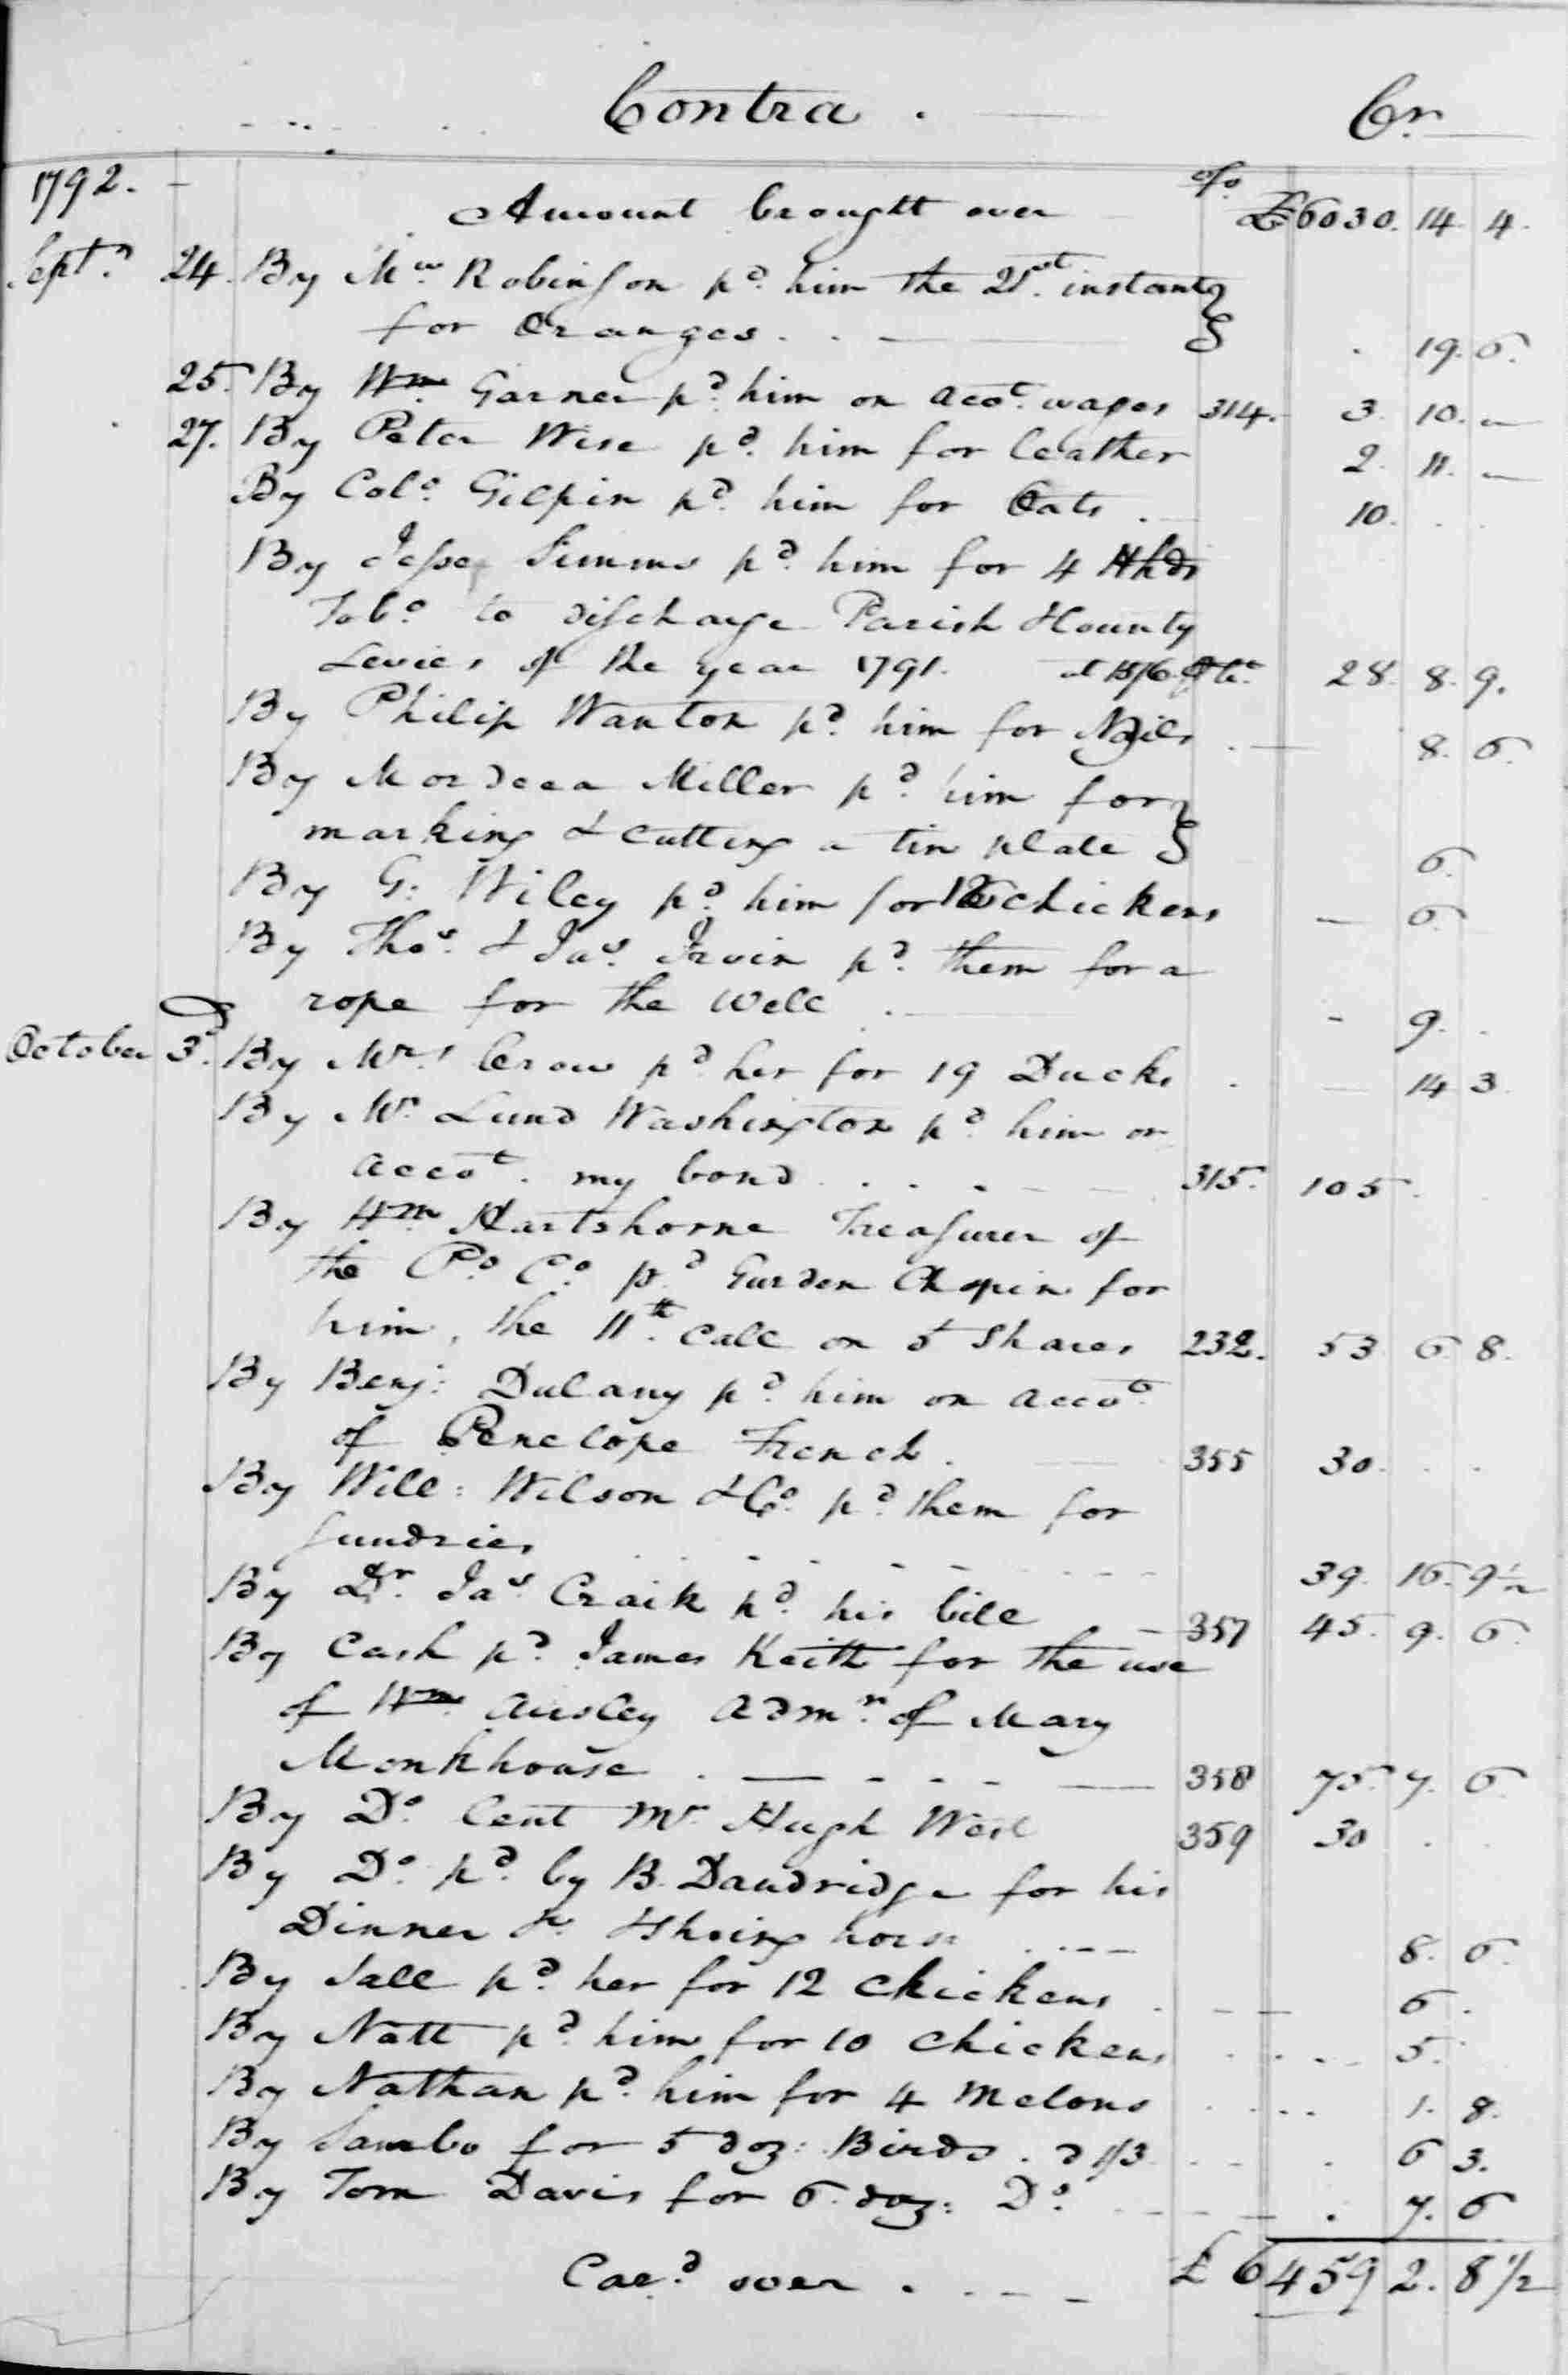 Ledger B, folio 346, right side